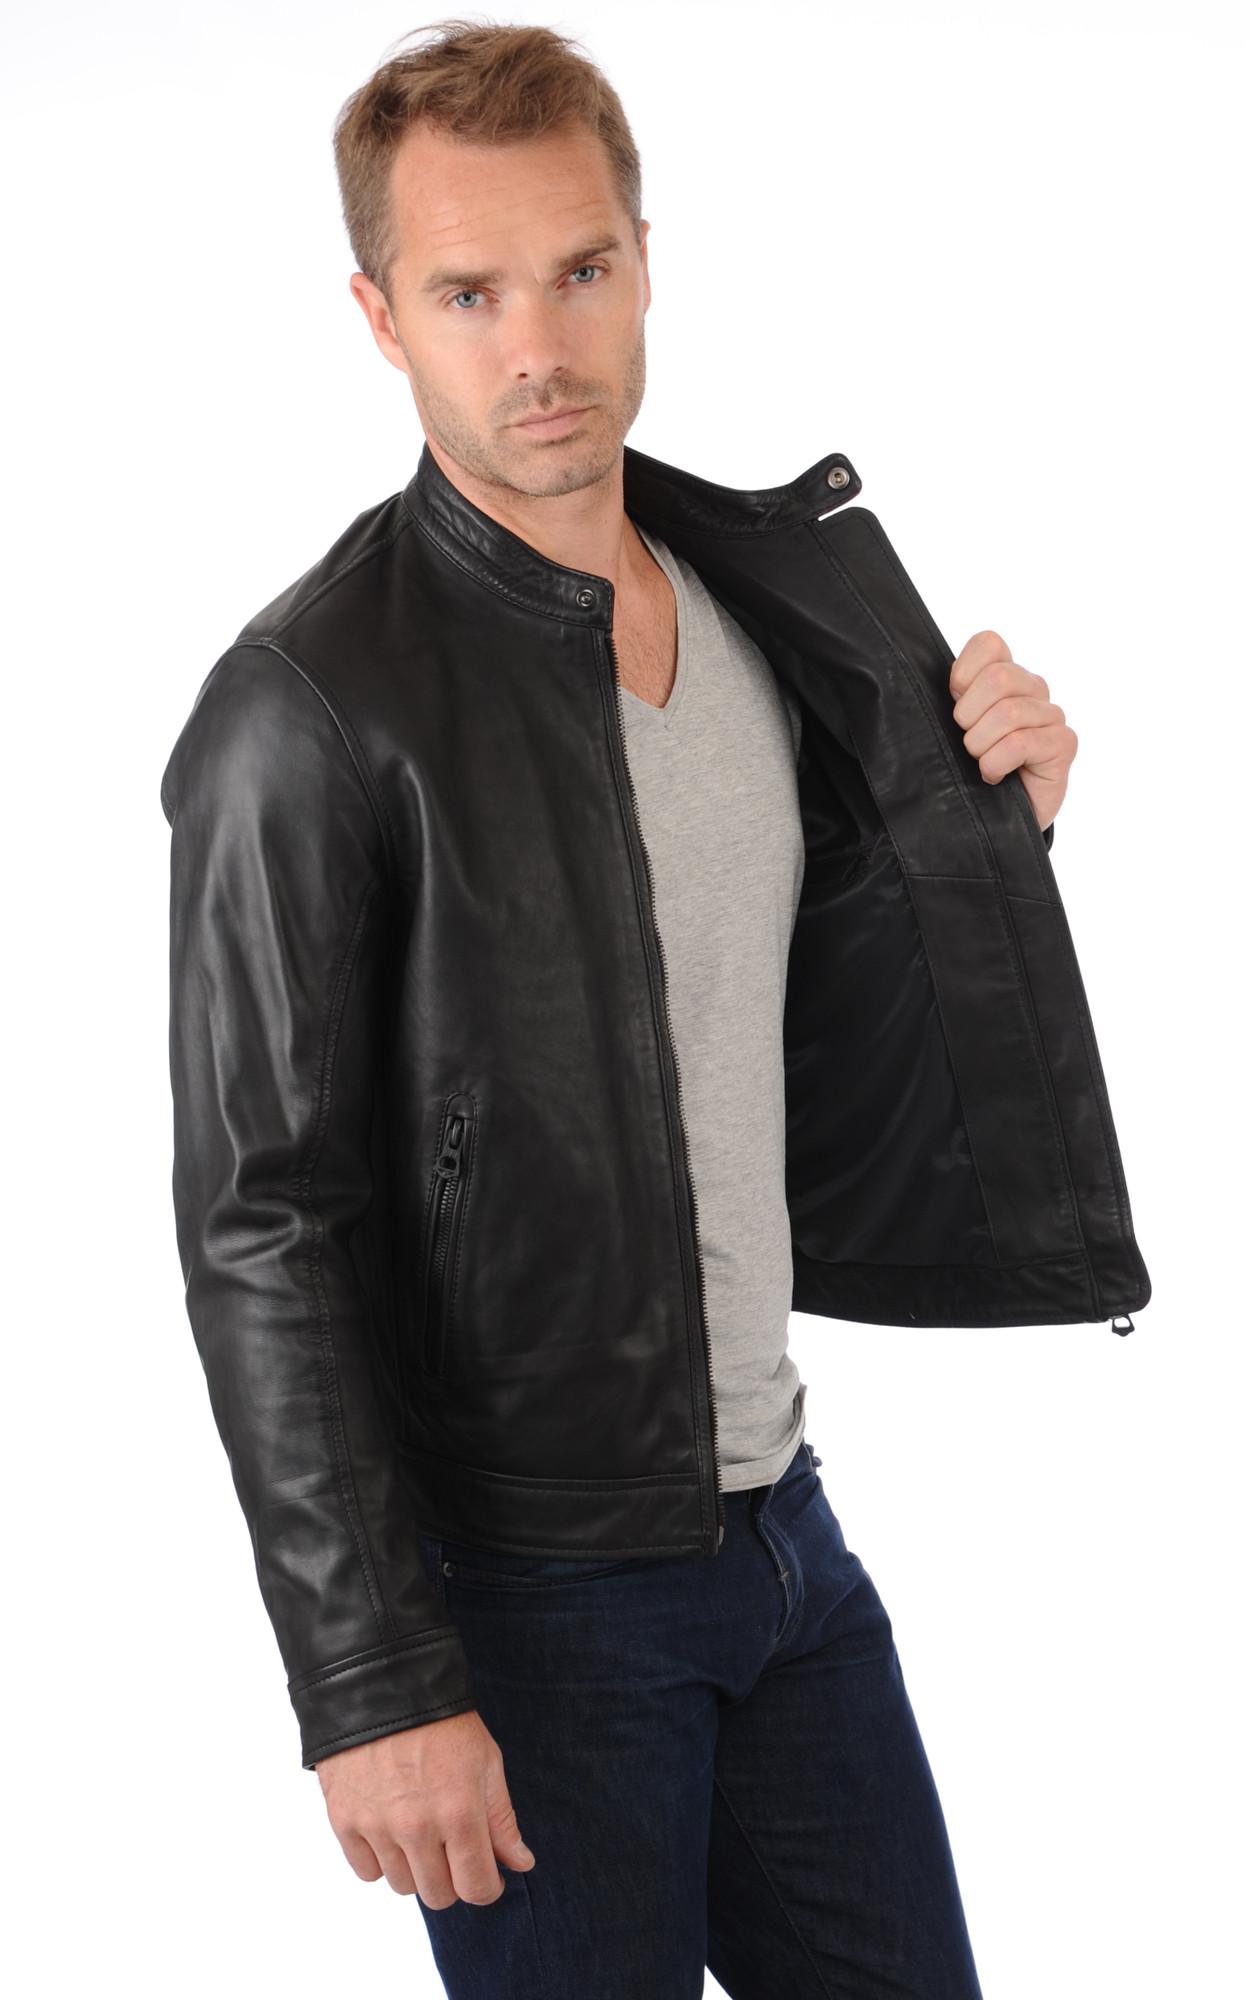 veste en cuir homme col mao les vestes la mode sont. Black Bedroom Furniture Sets. Home Design Ideas